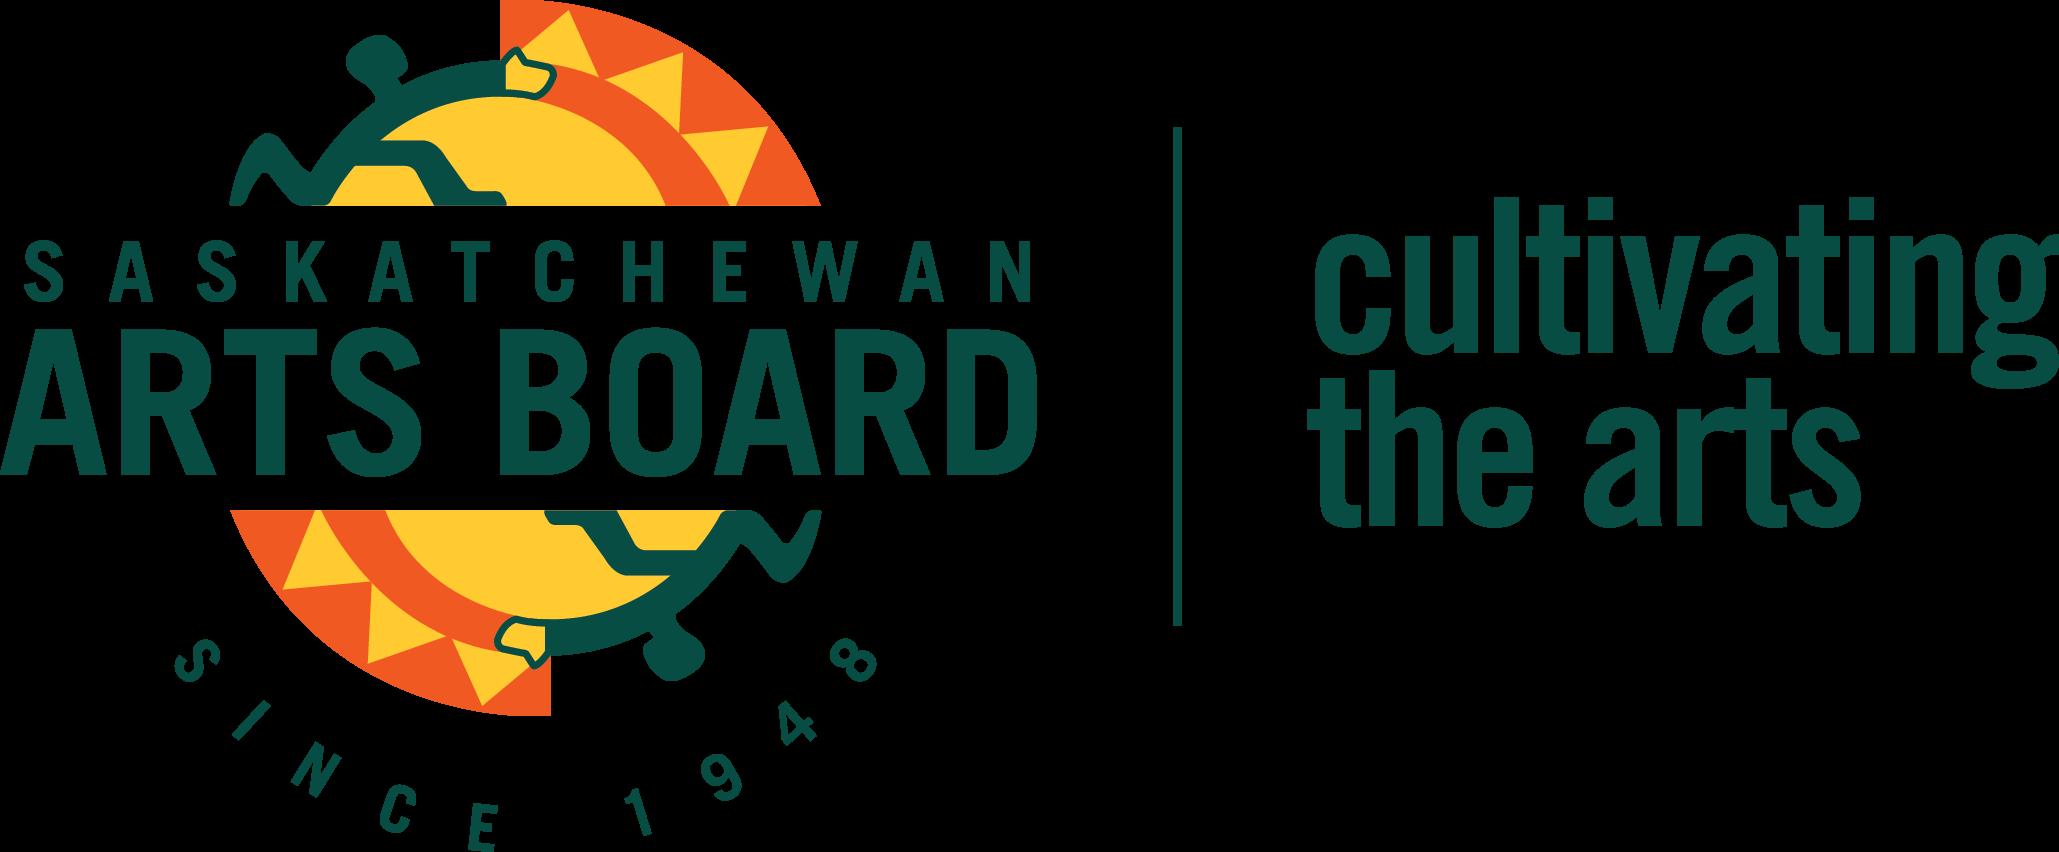 Sask Arts Board logo colour PNG 2017